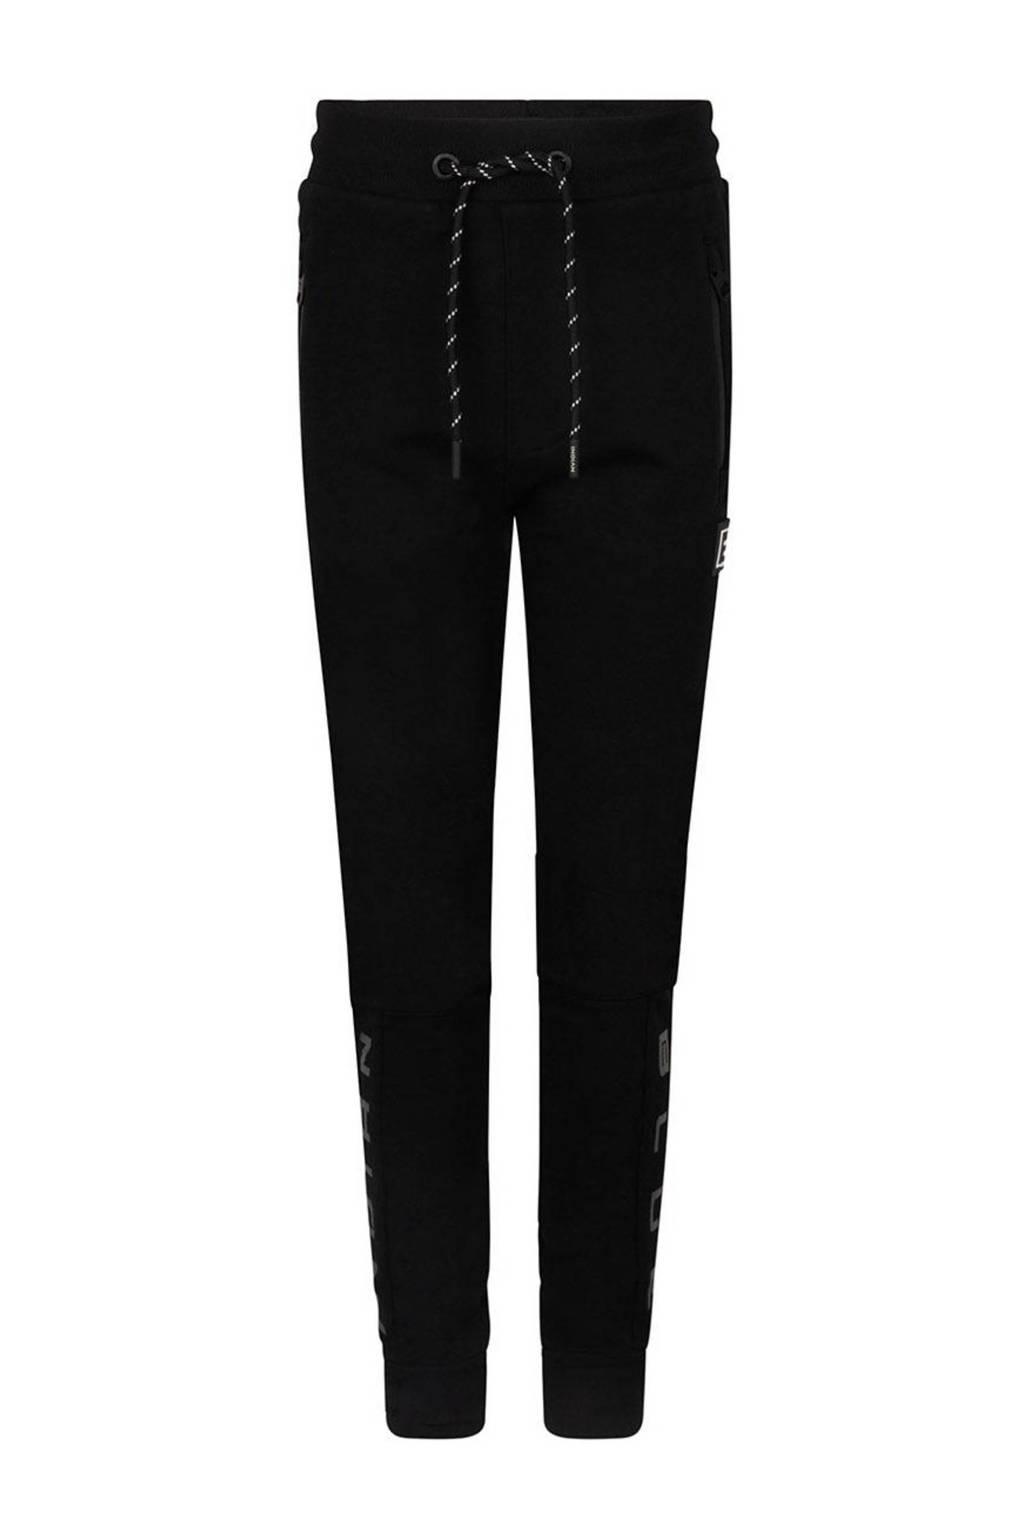 Indian Blue Jeans skinny joggingbroek zwart, Zwart